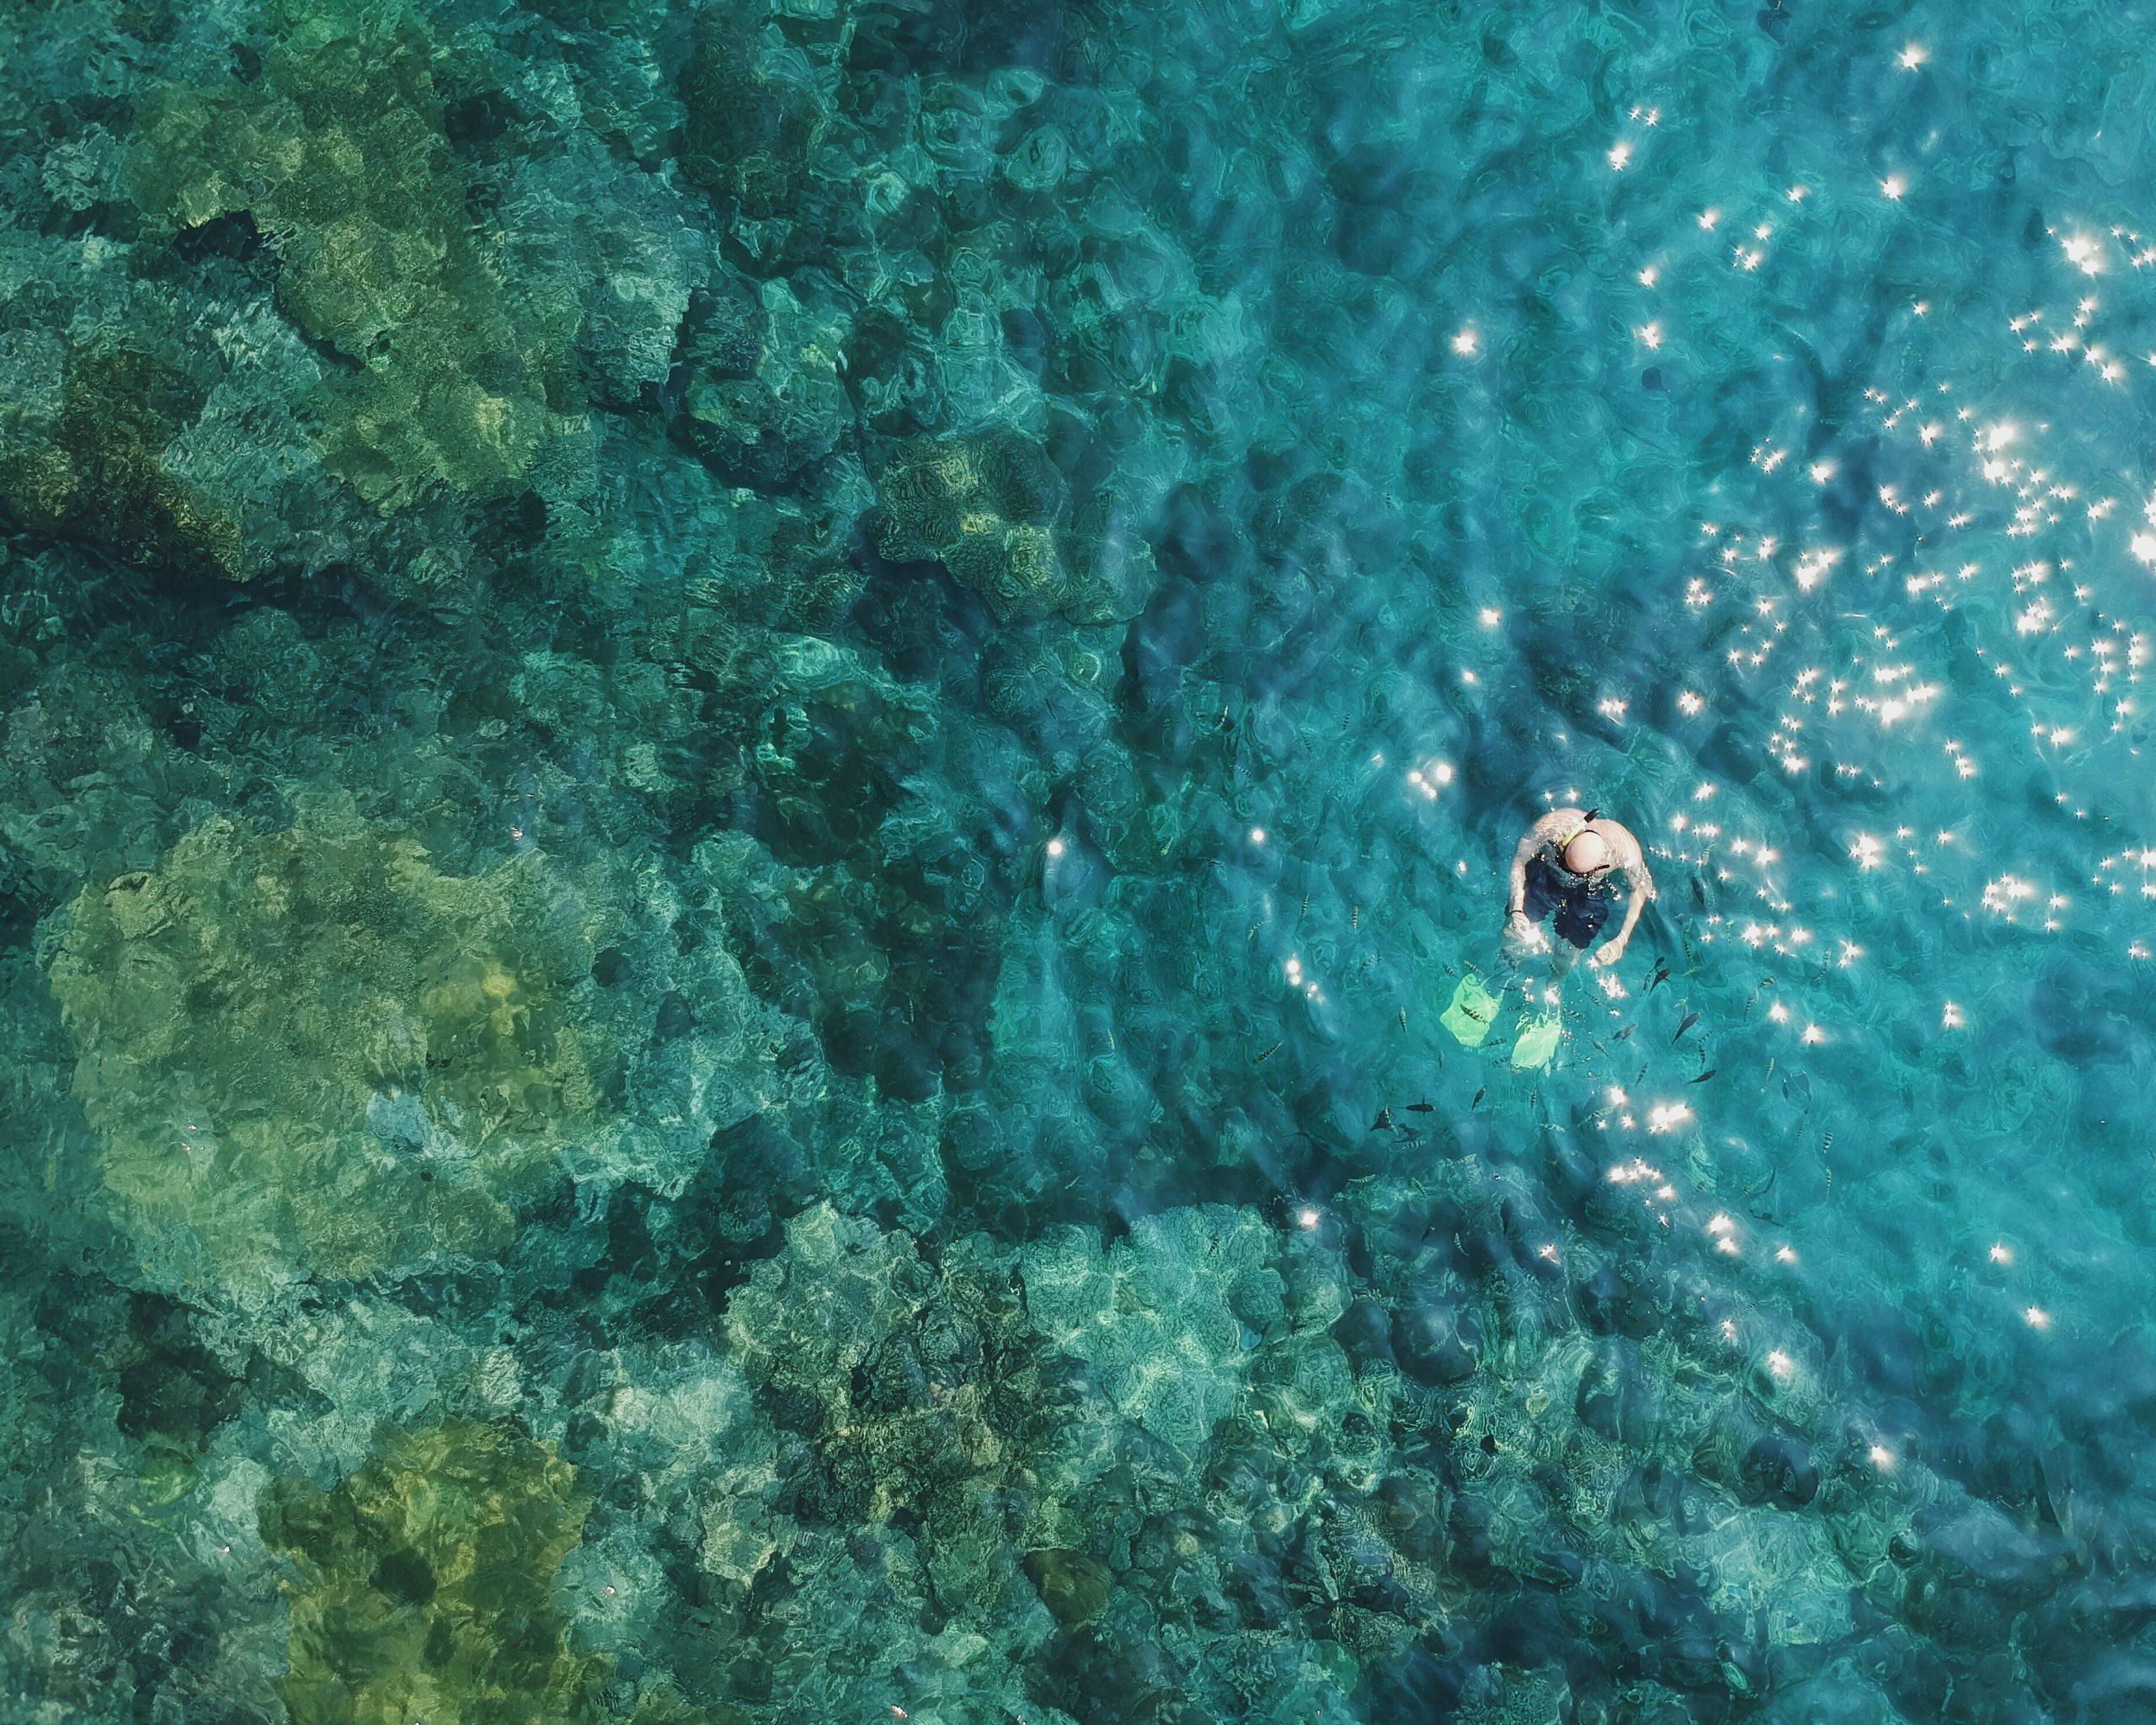 vitamin sea and digital detox